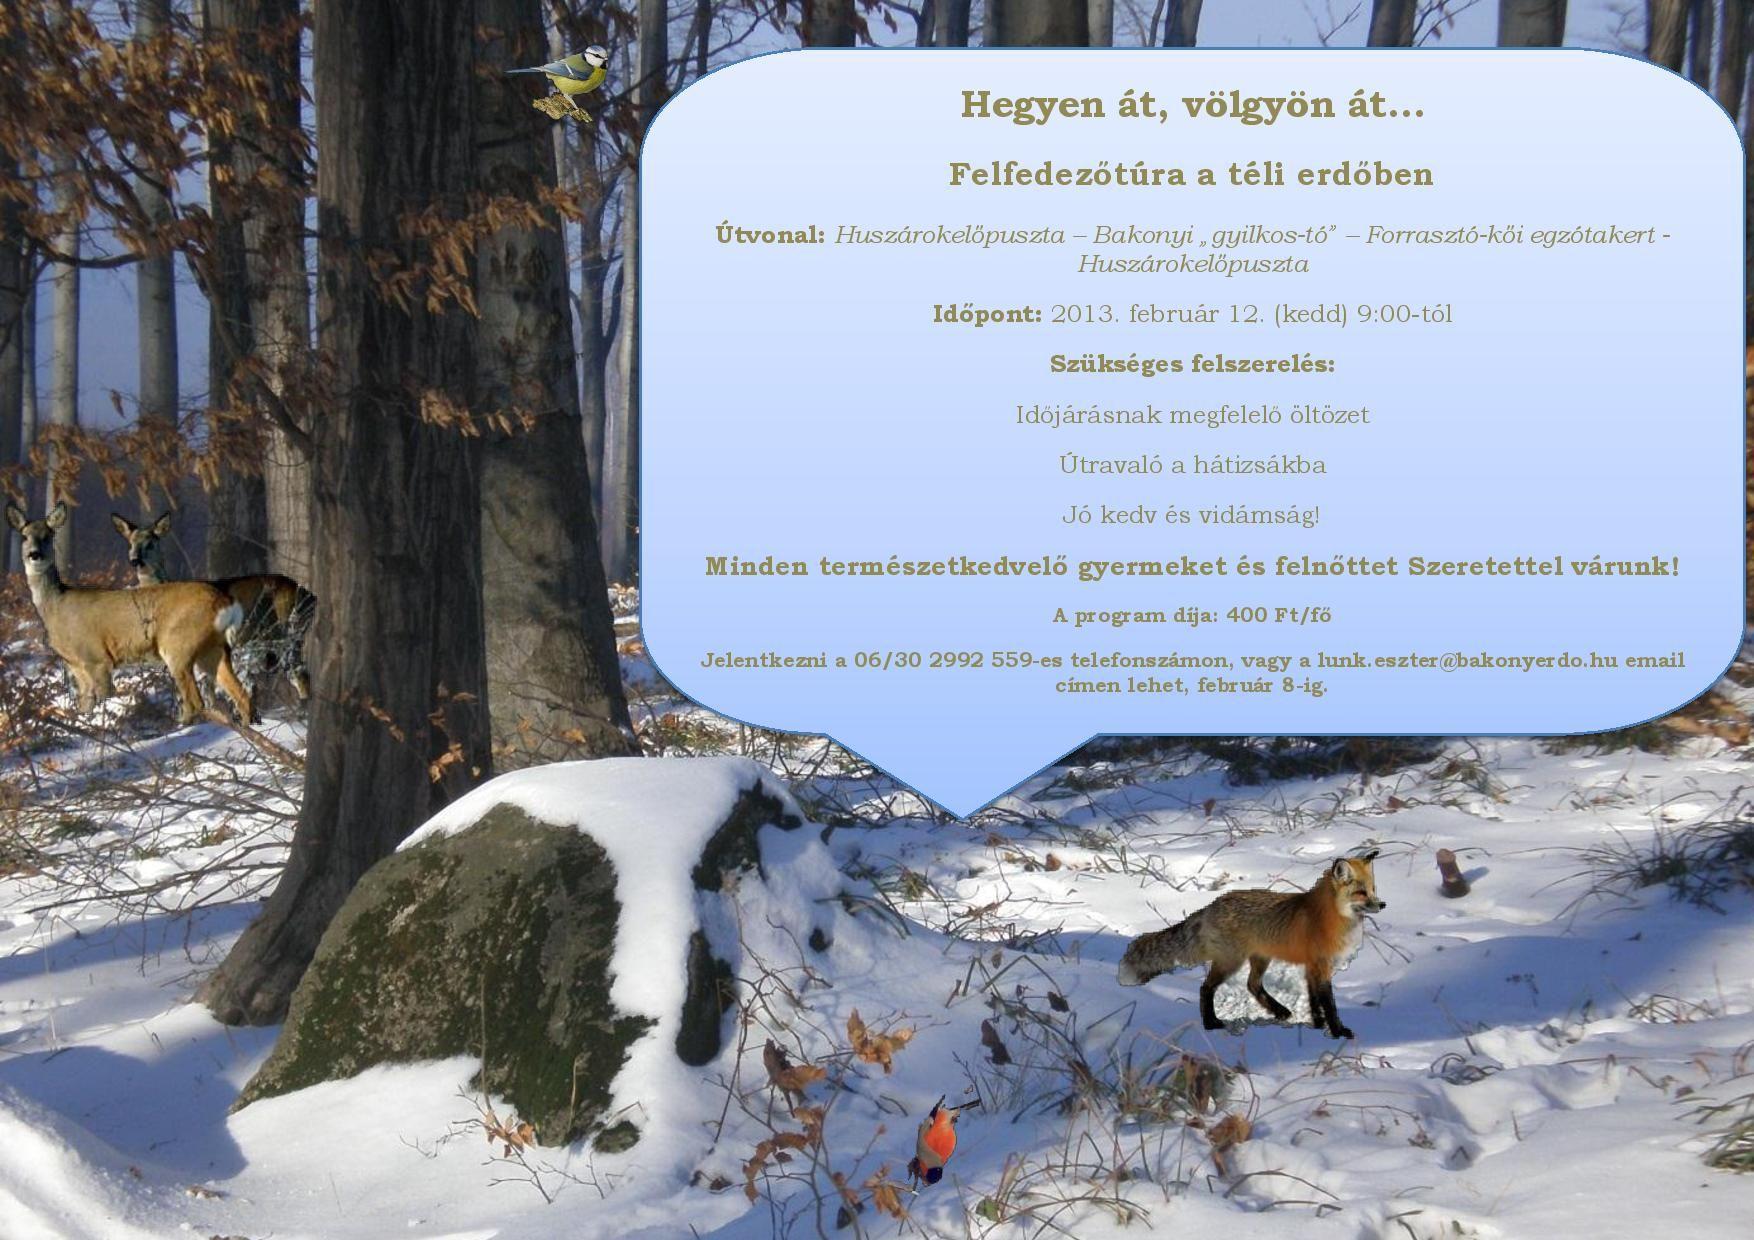 februar-page-001_1360222249.jpg_1754x1240